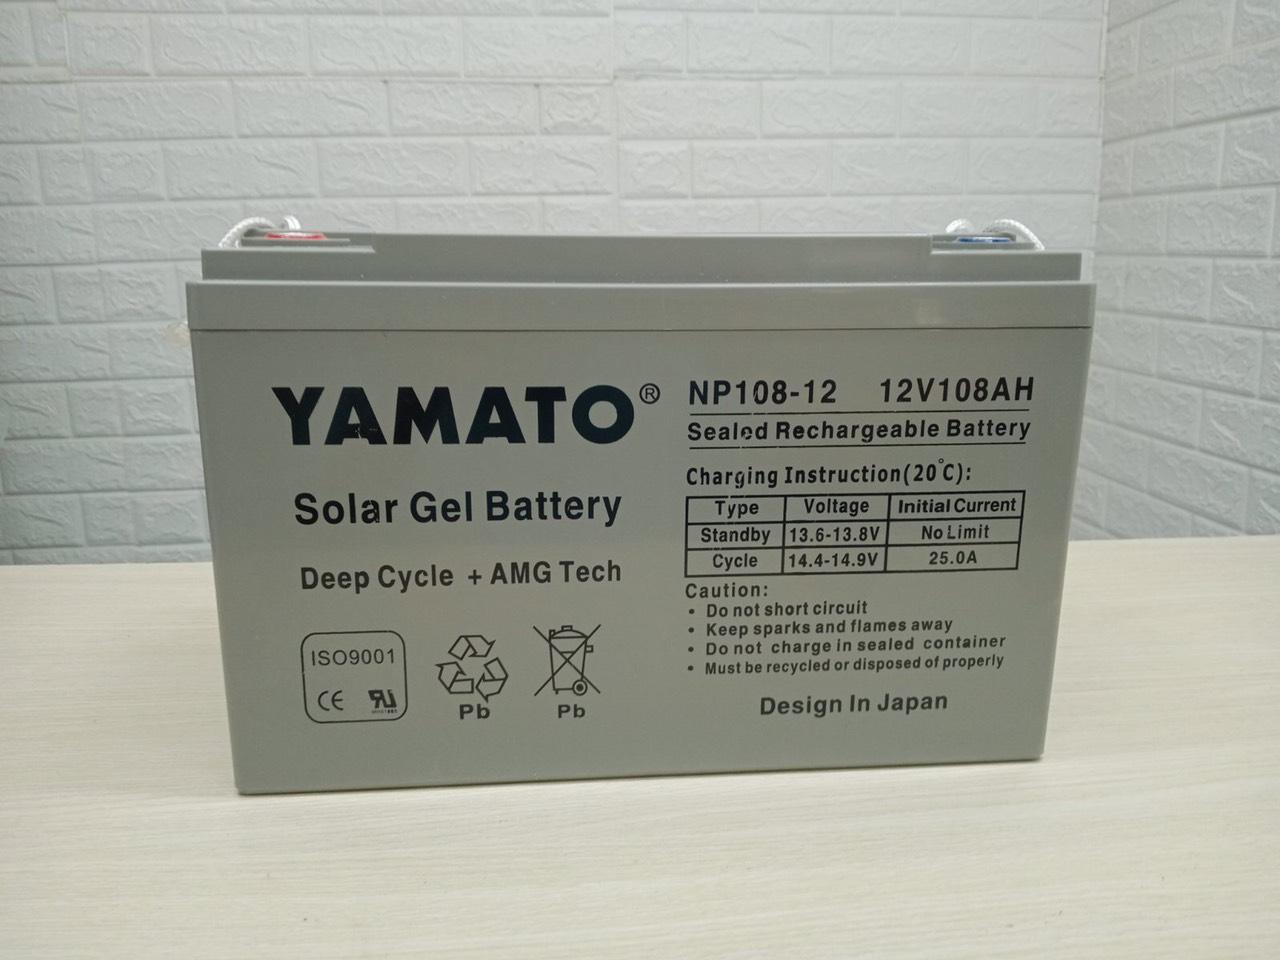 Ắc quy Yamato NP 108-12 (12v 108ah).